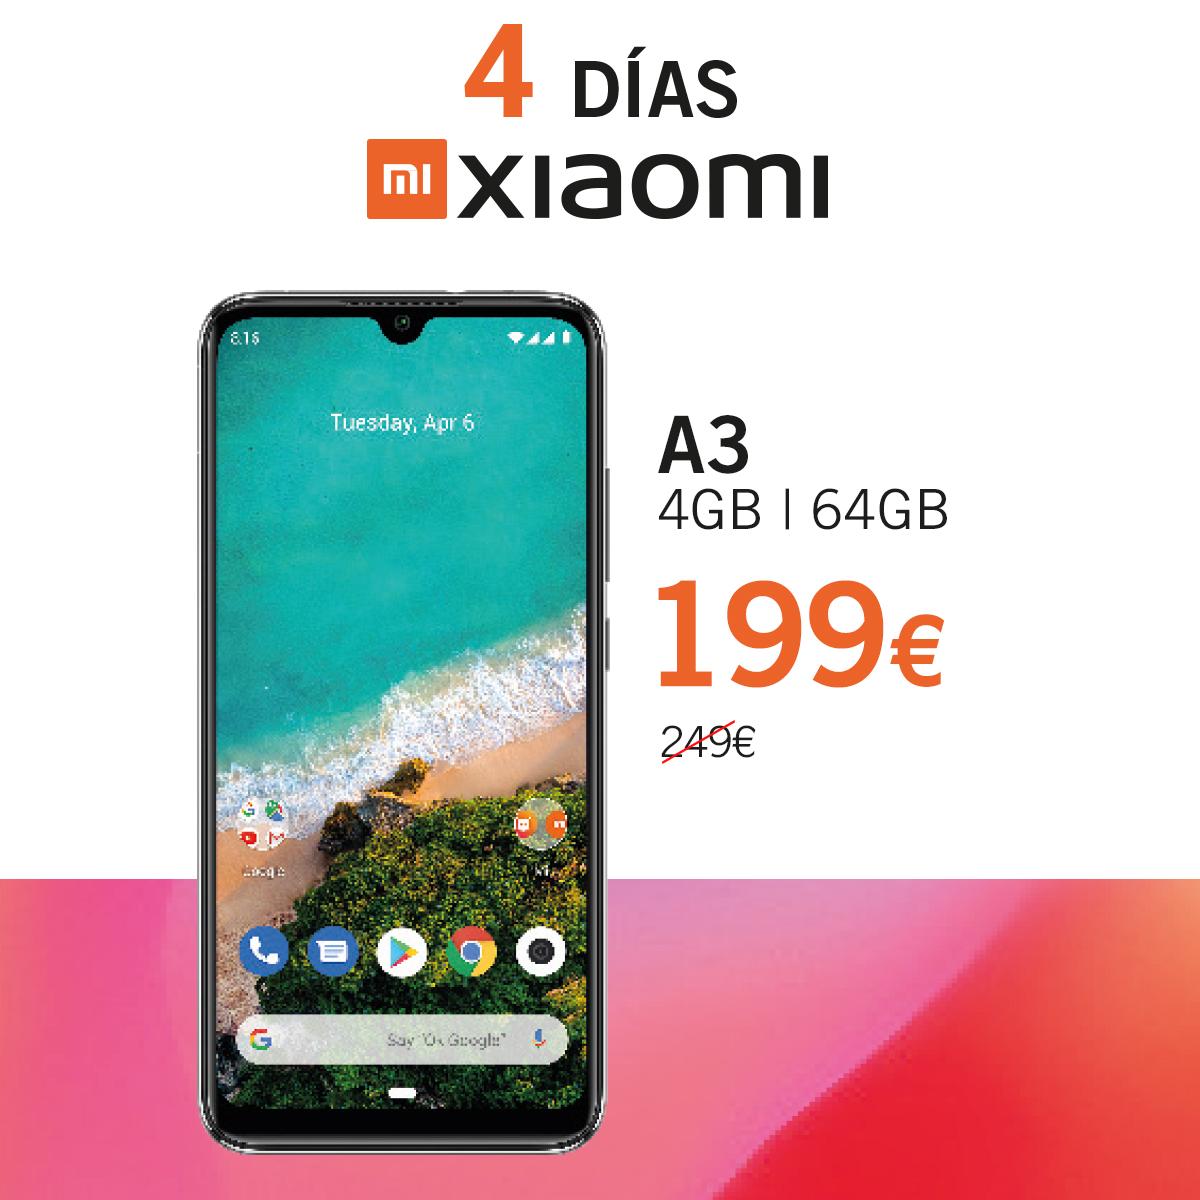 A3 Dias Xiaomi